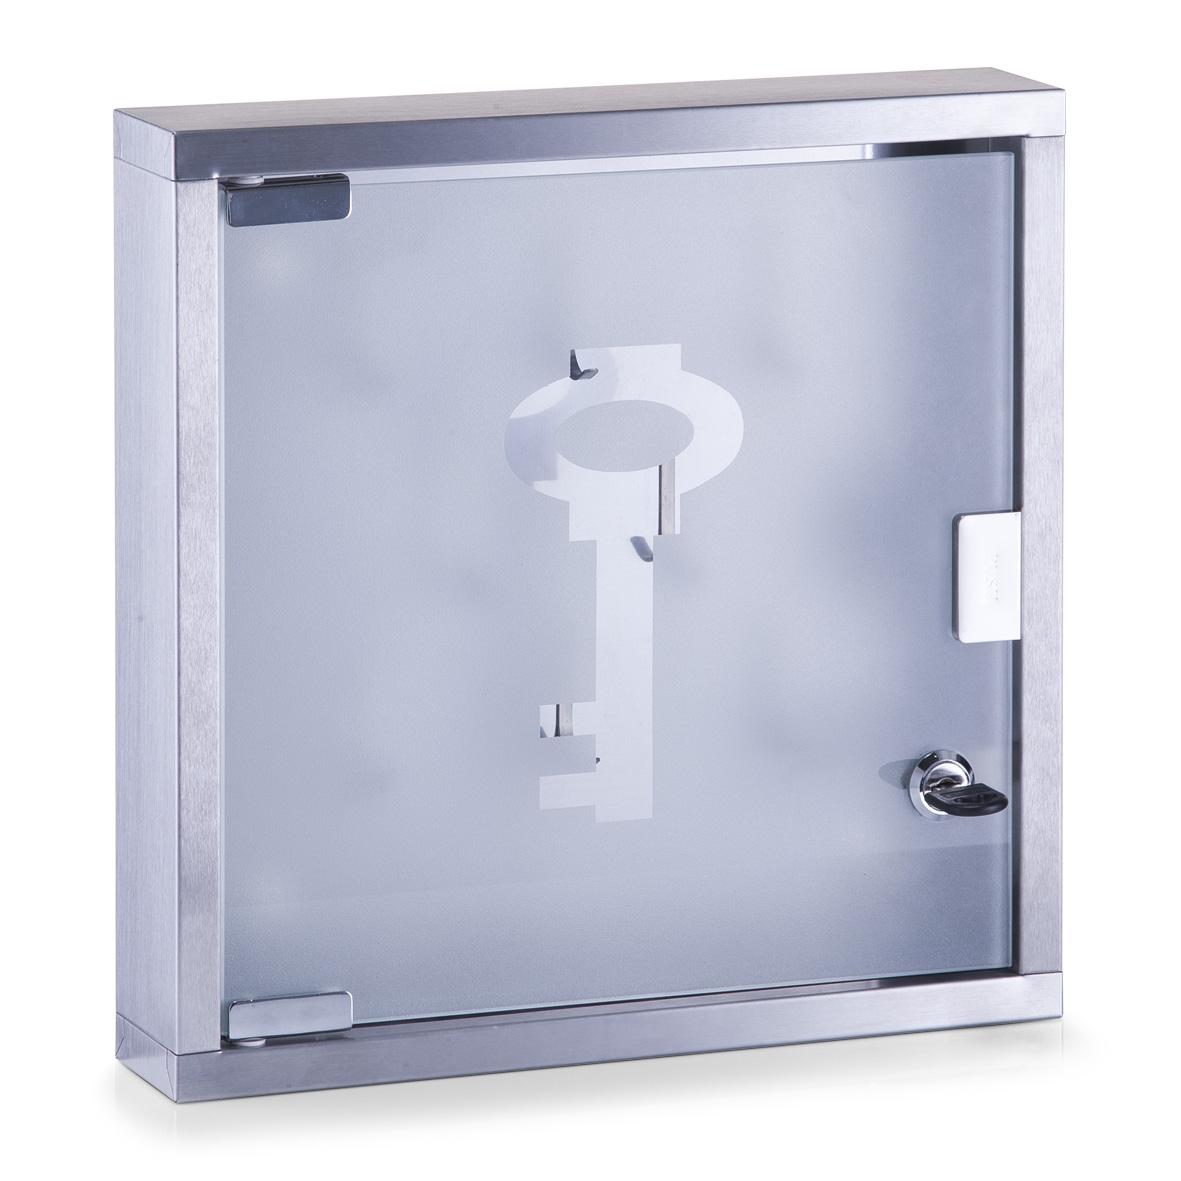 Suport pentru chei Office II, Otel inoxidabil, l30xA6xH30 cm imagine